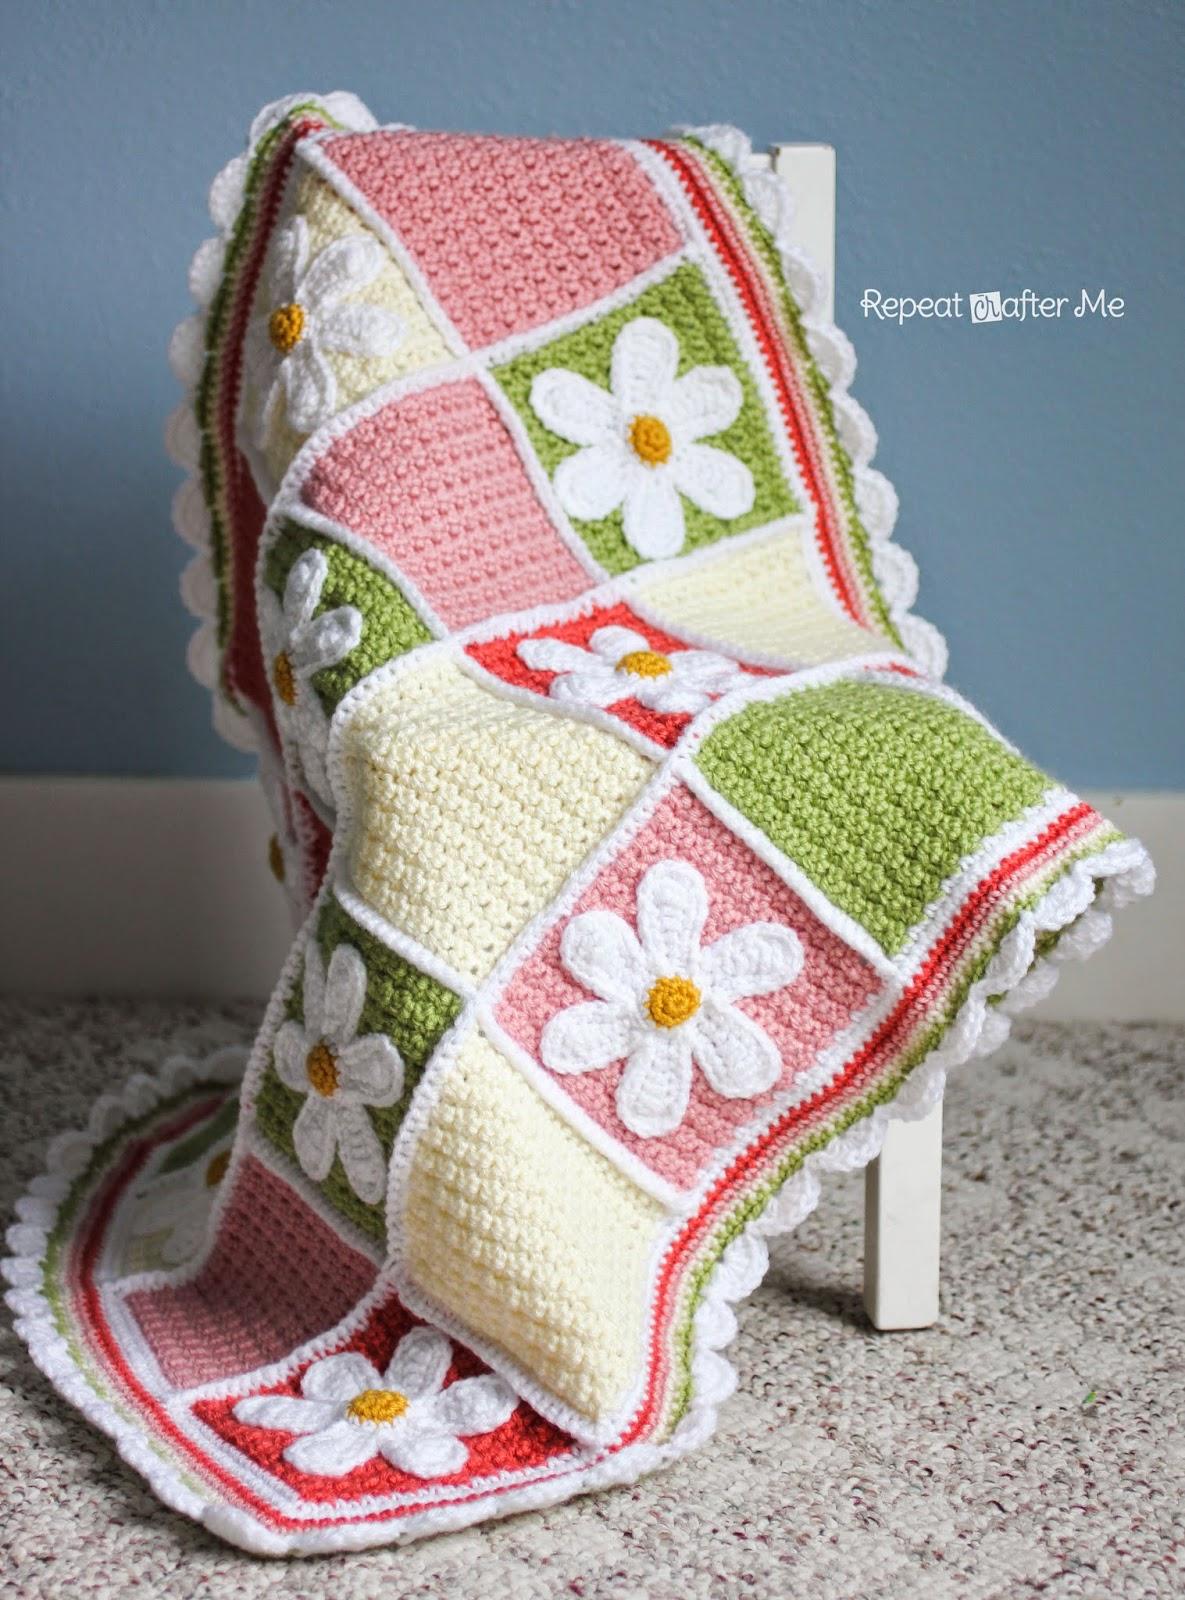 Crochet Daisy Flower Blanket Pattern : Crochet Daisy Afghan - Repeat Crafter Me